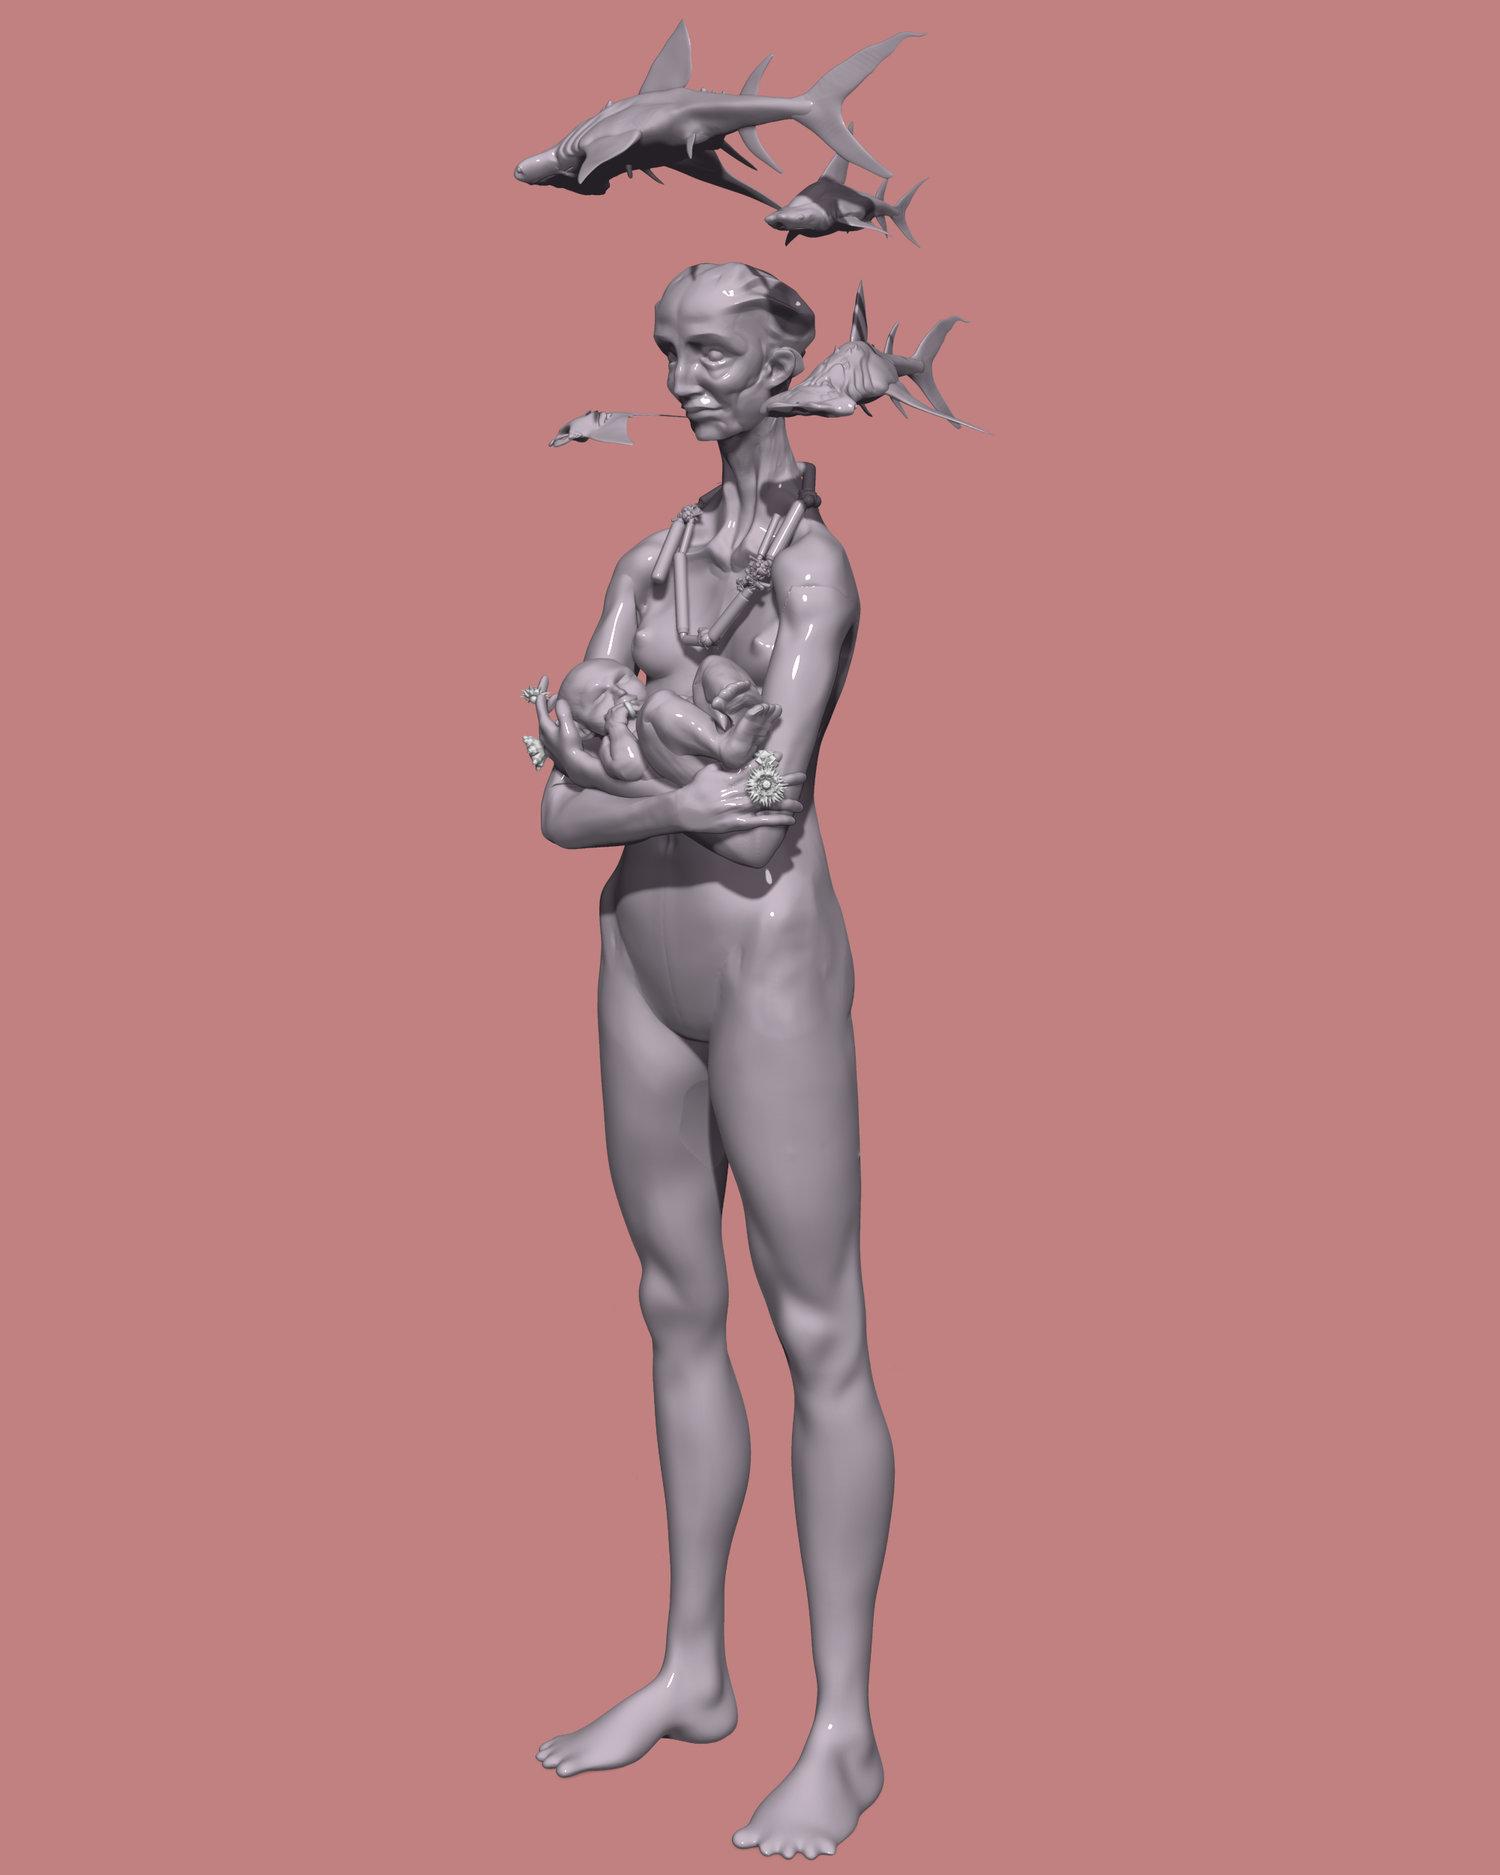 Max+Brazier-Jones+concept+art+witch+zbrush+6.jpg